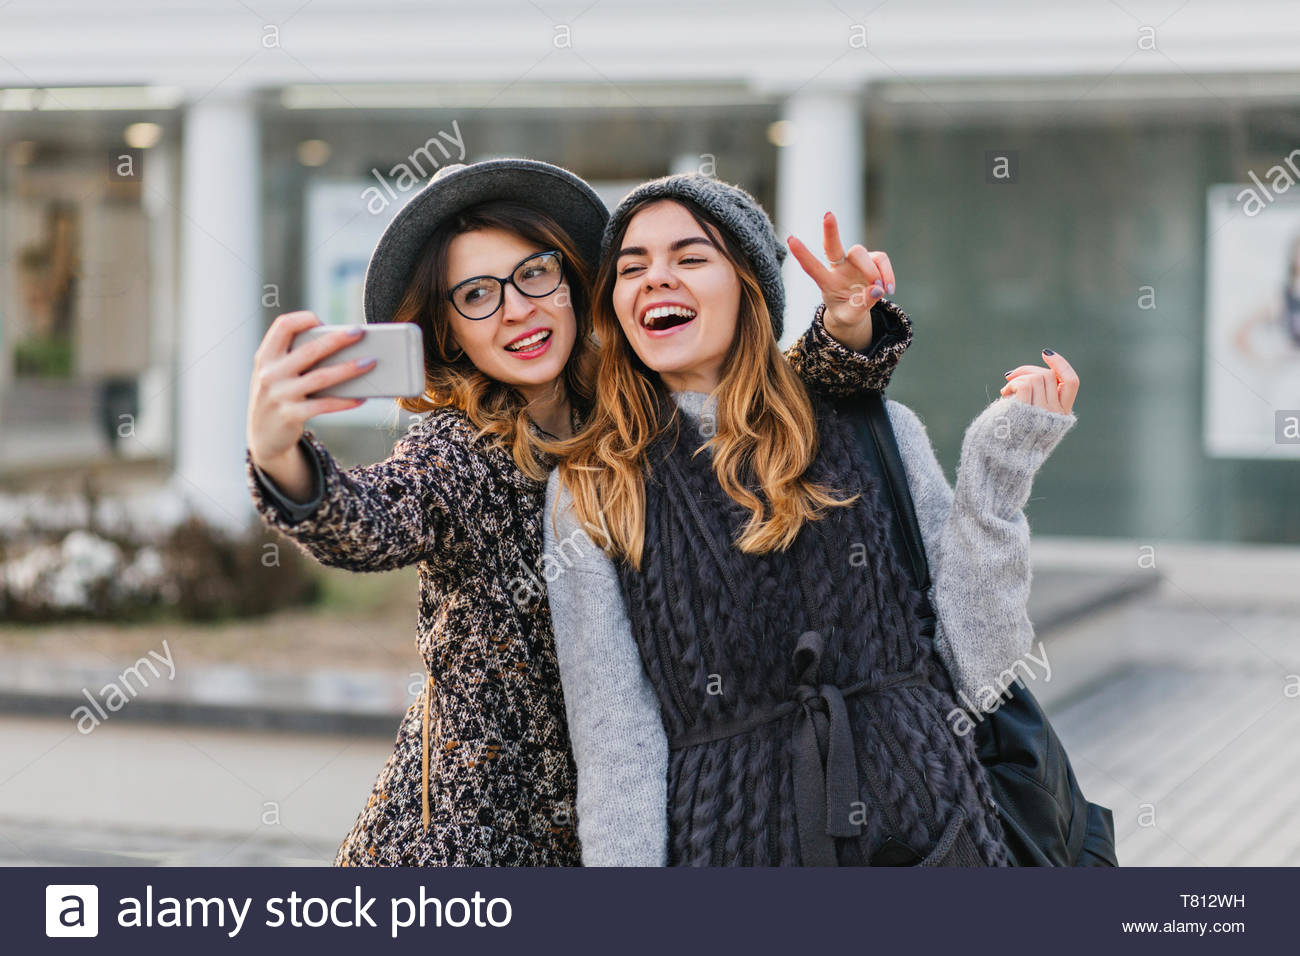 9dda980b8f05e Selfie portrait of joyful fashionable girls having fun on sunny street in  city. Stylish look